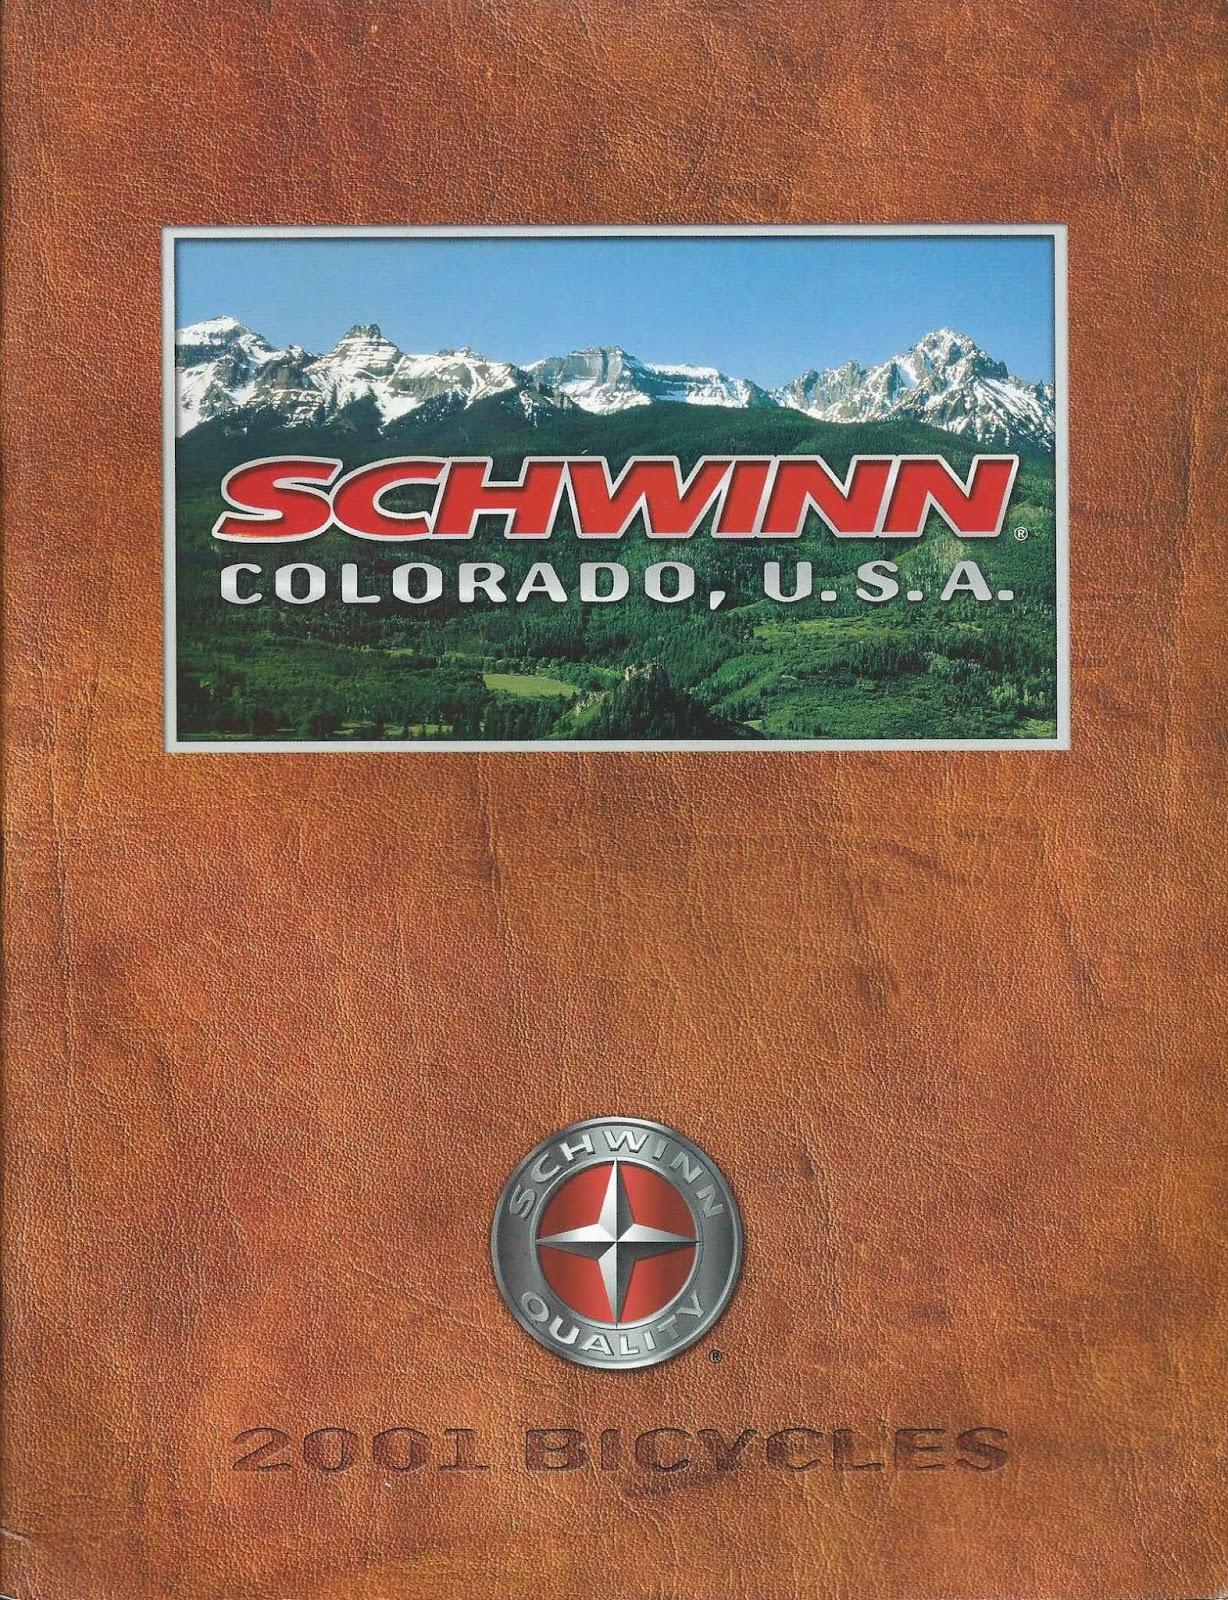 The Old Bike Shop: 2001 Schwinn catalog